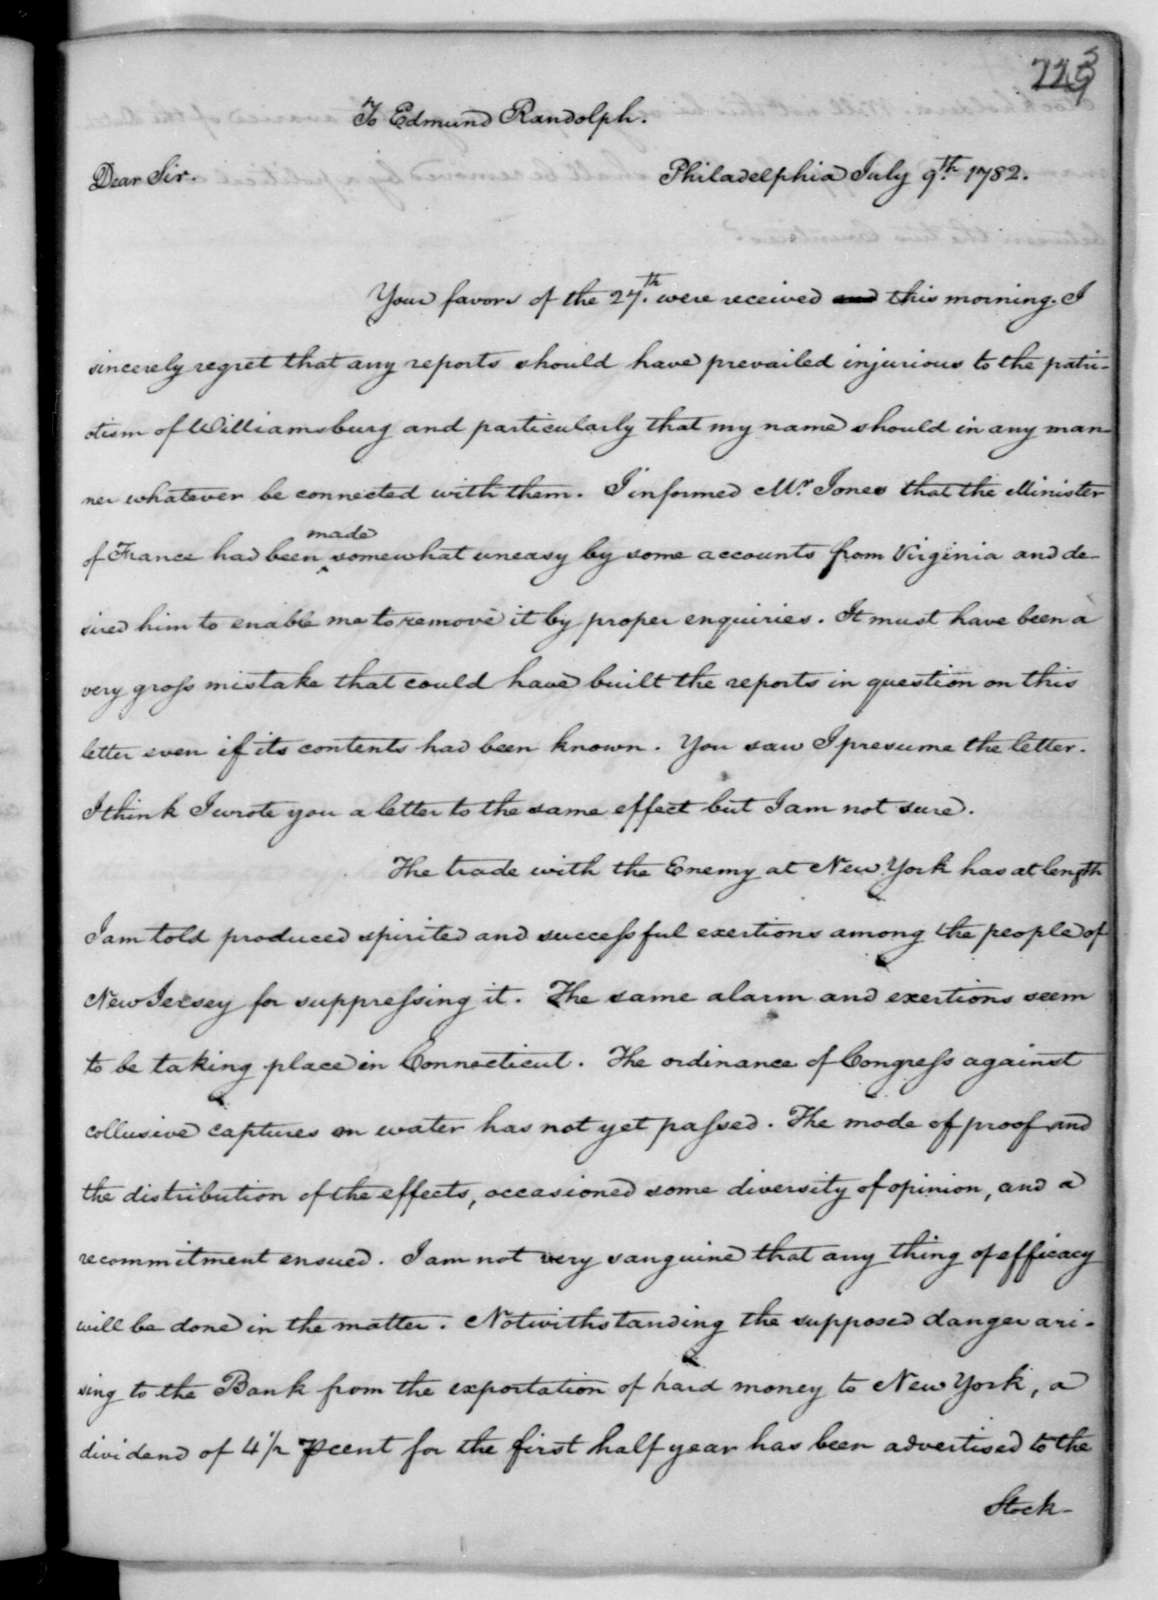 James Madison to Edmund Randolph, July 9, 1782.